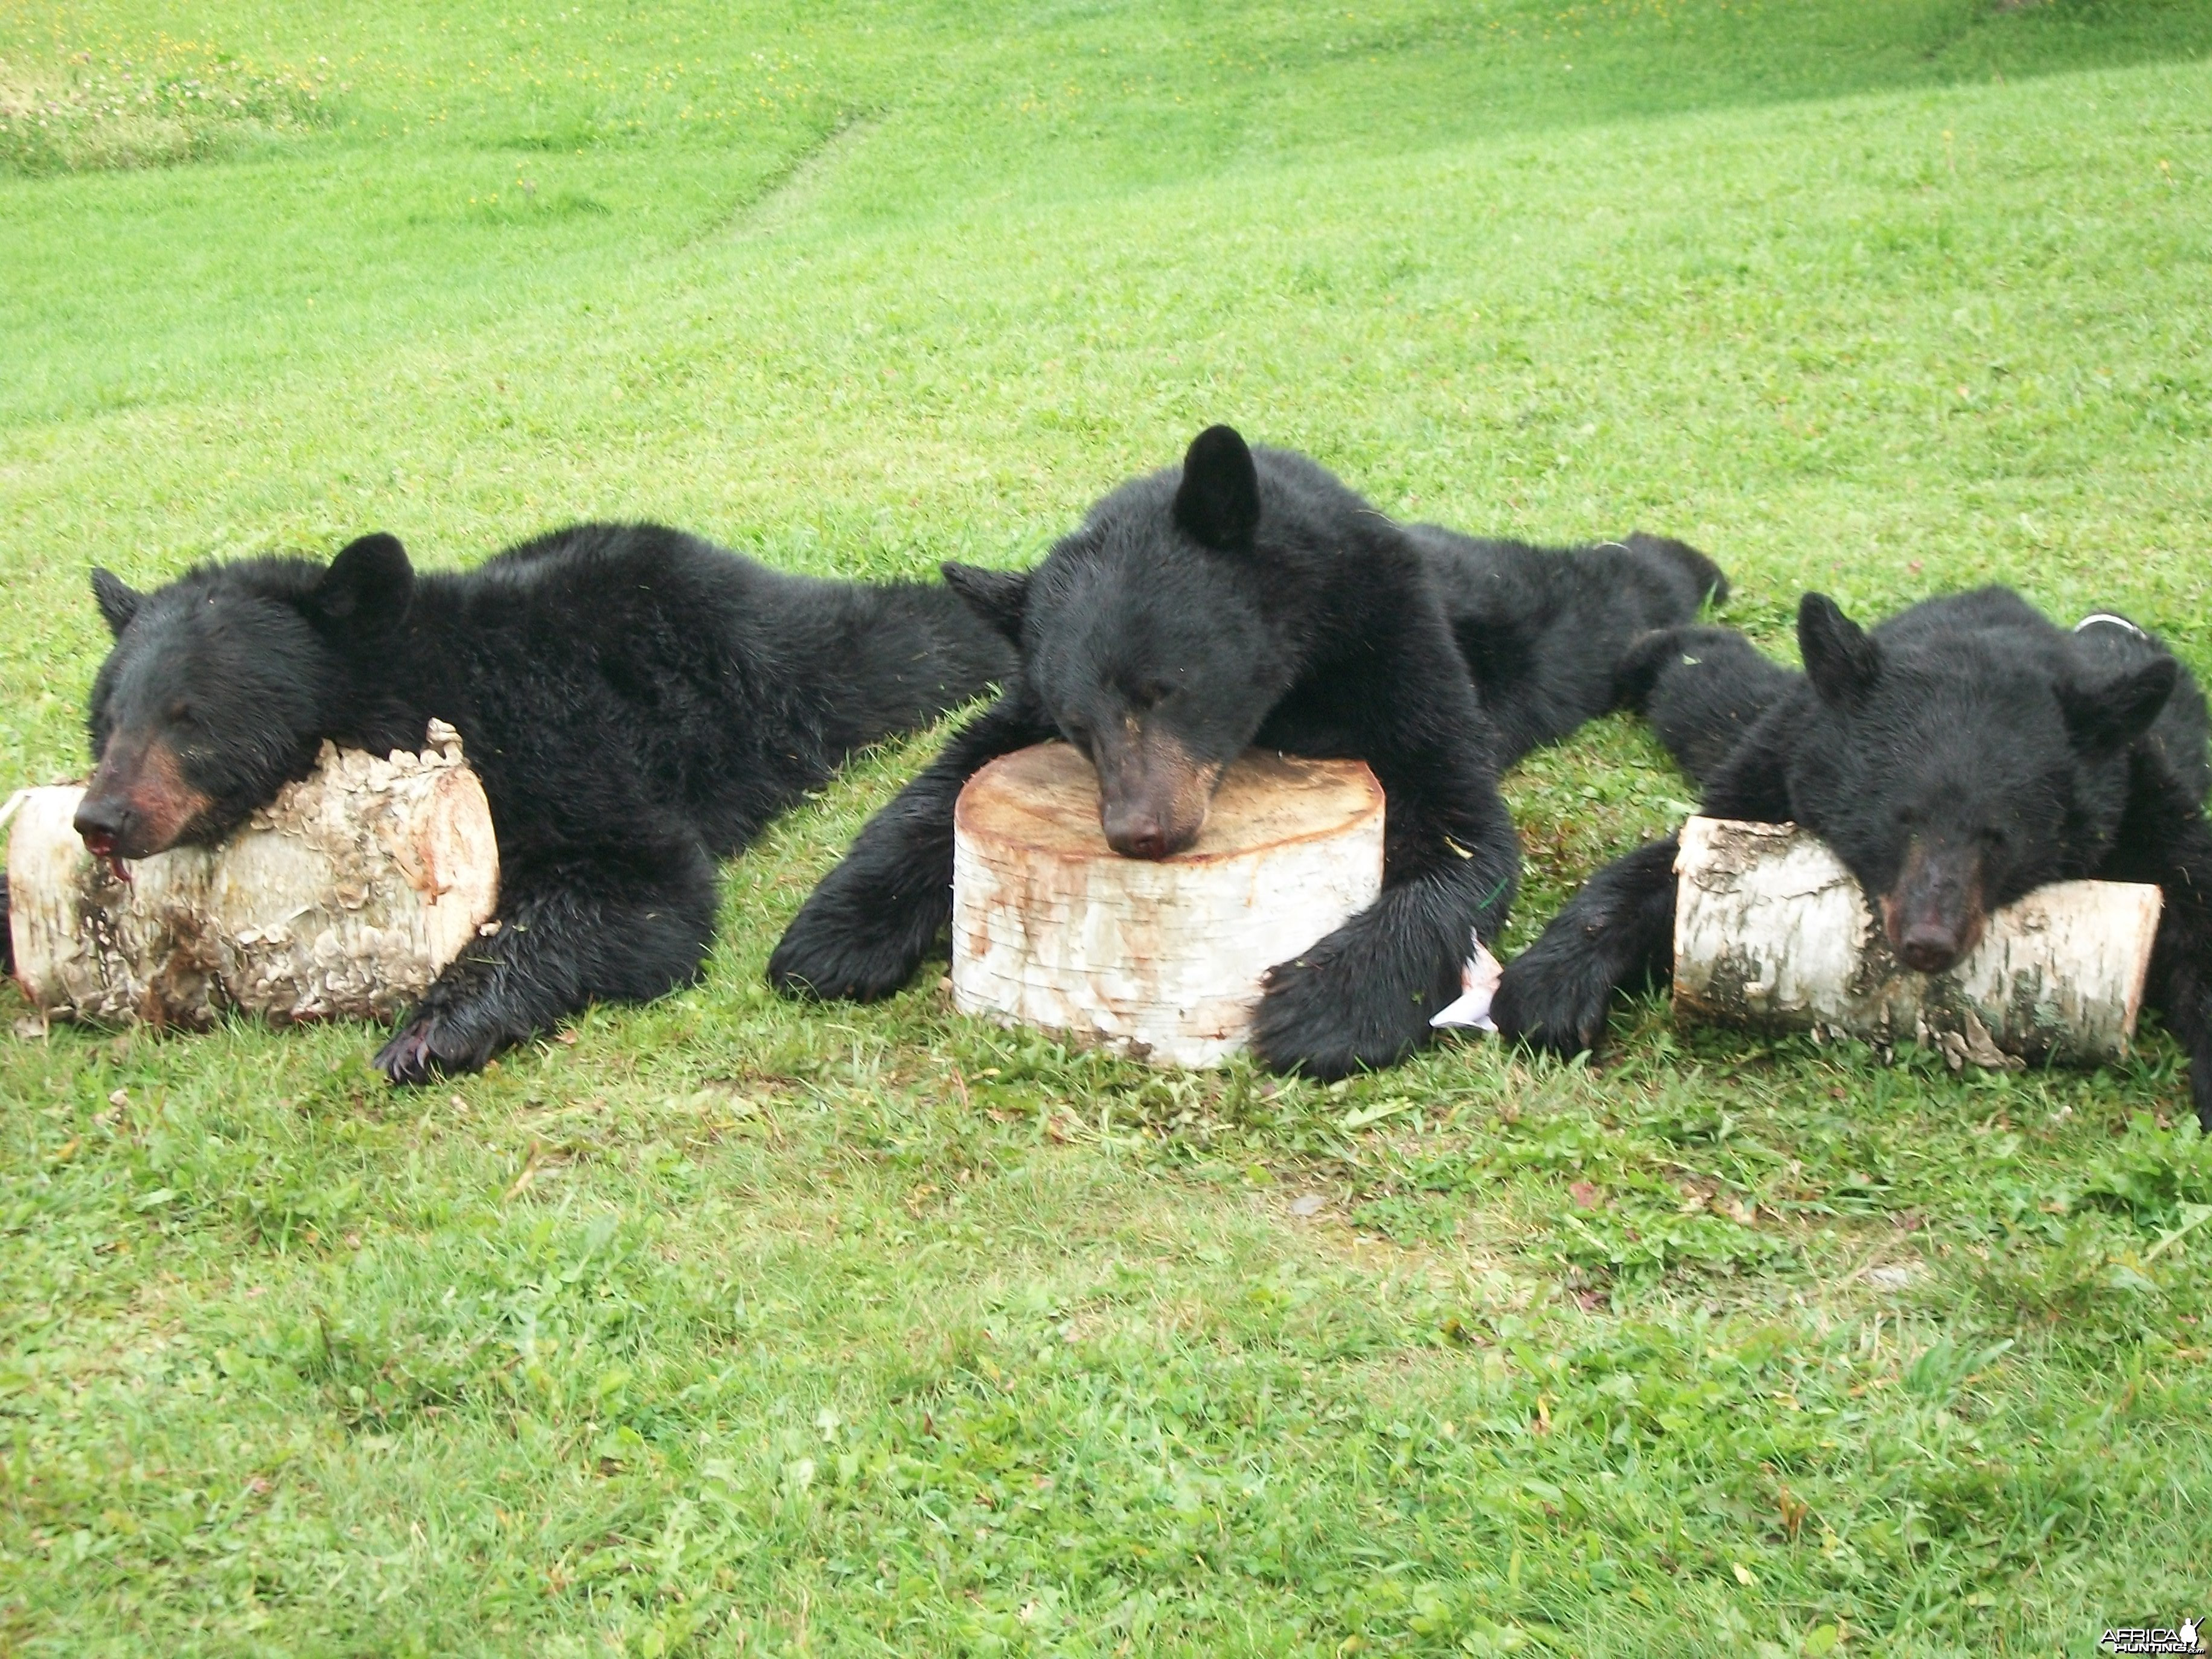 Maine bears